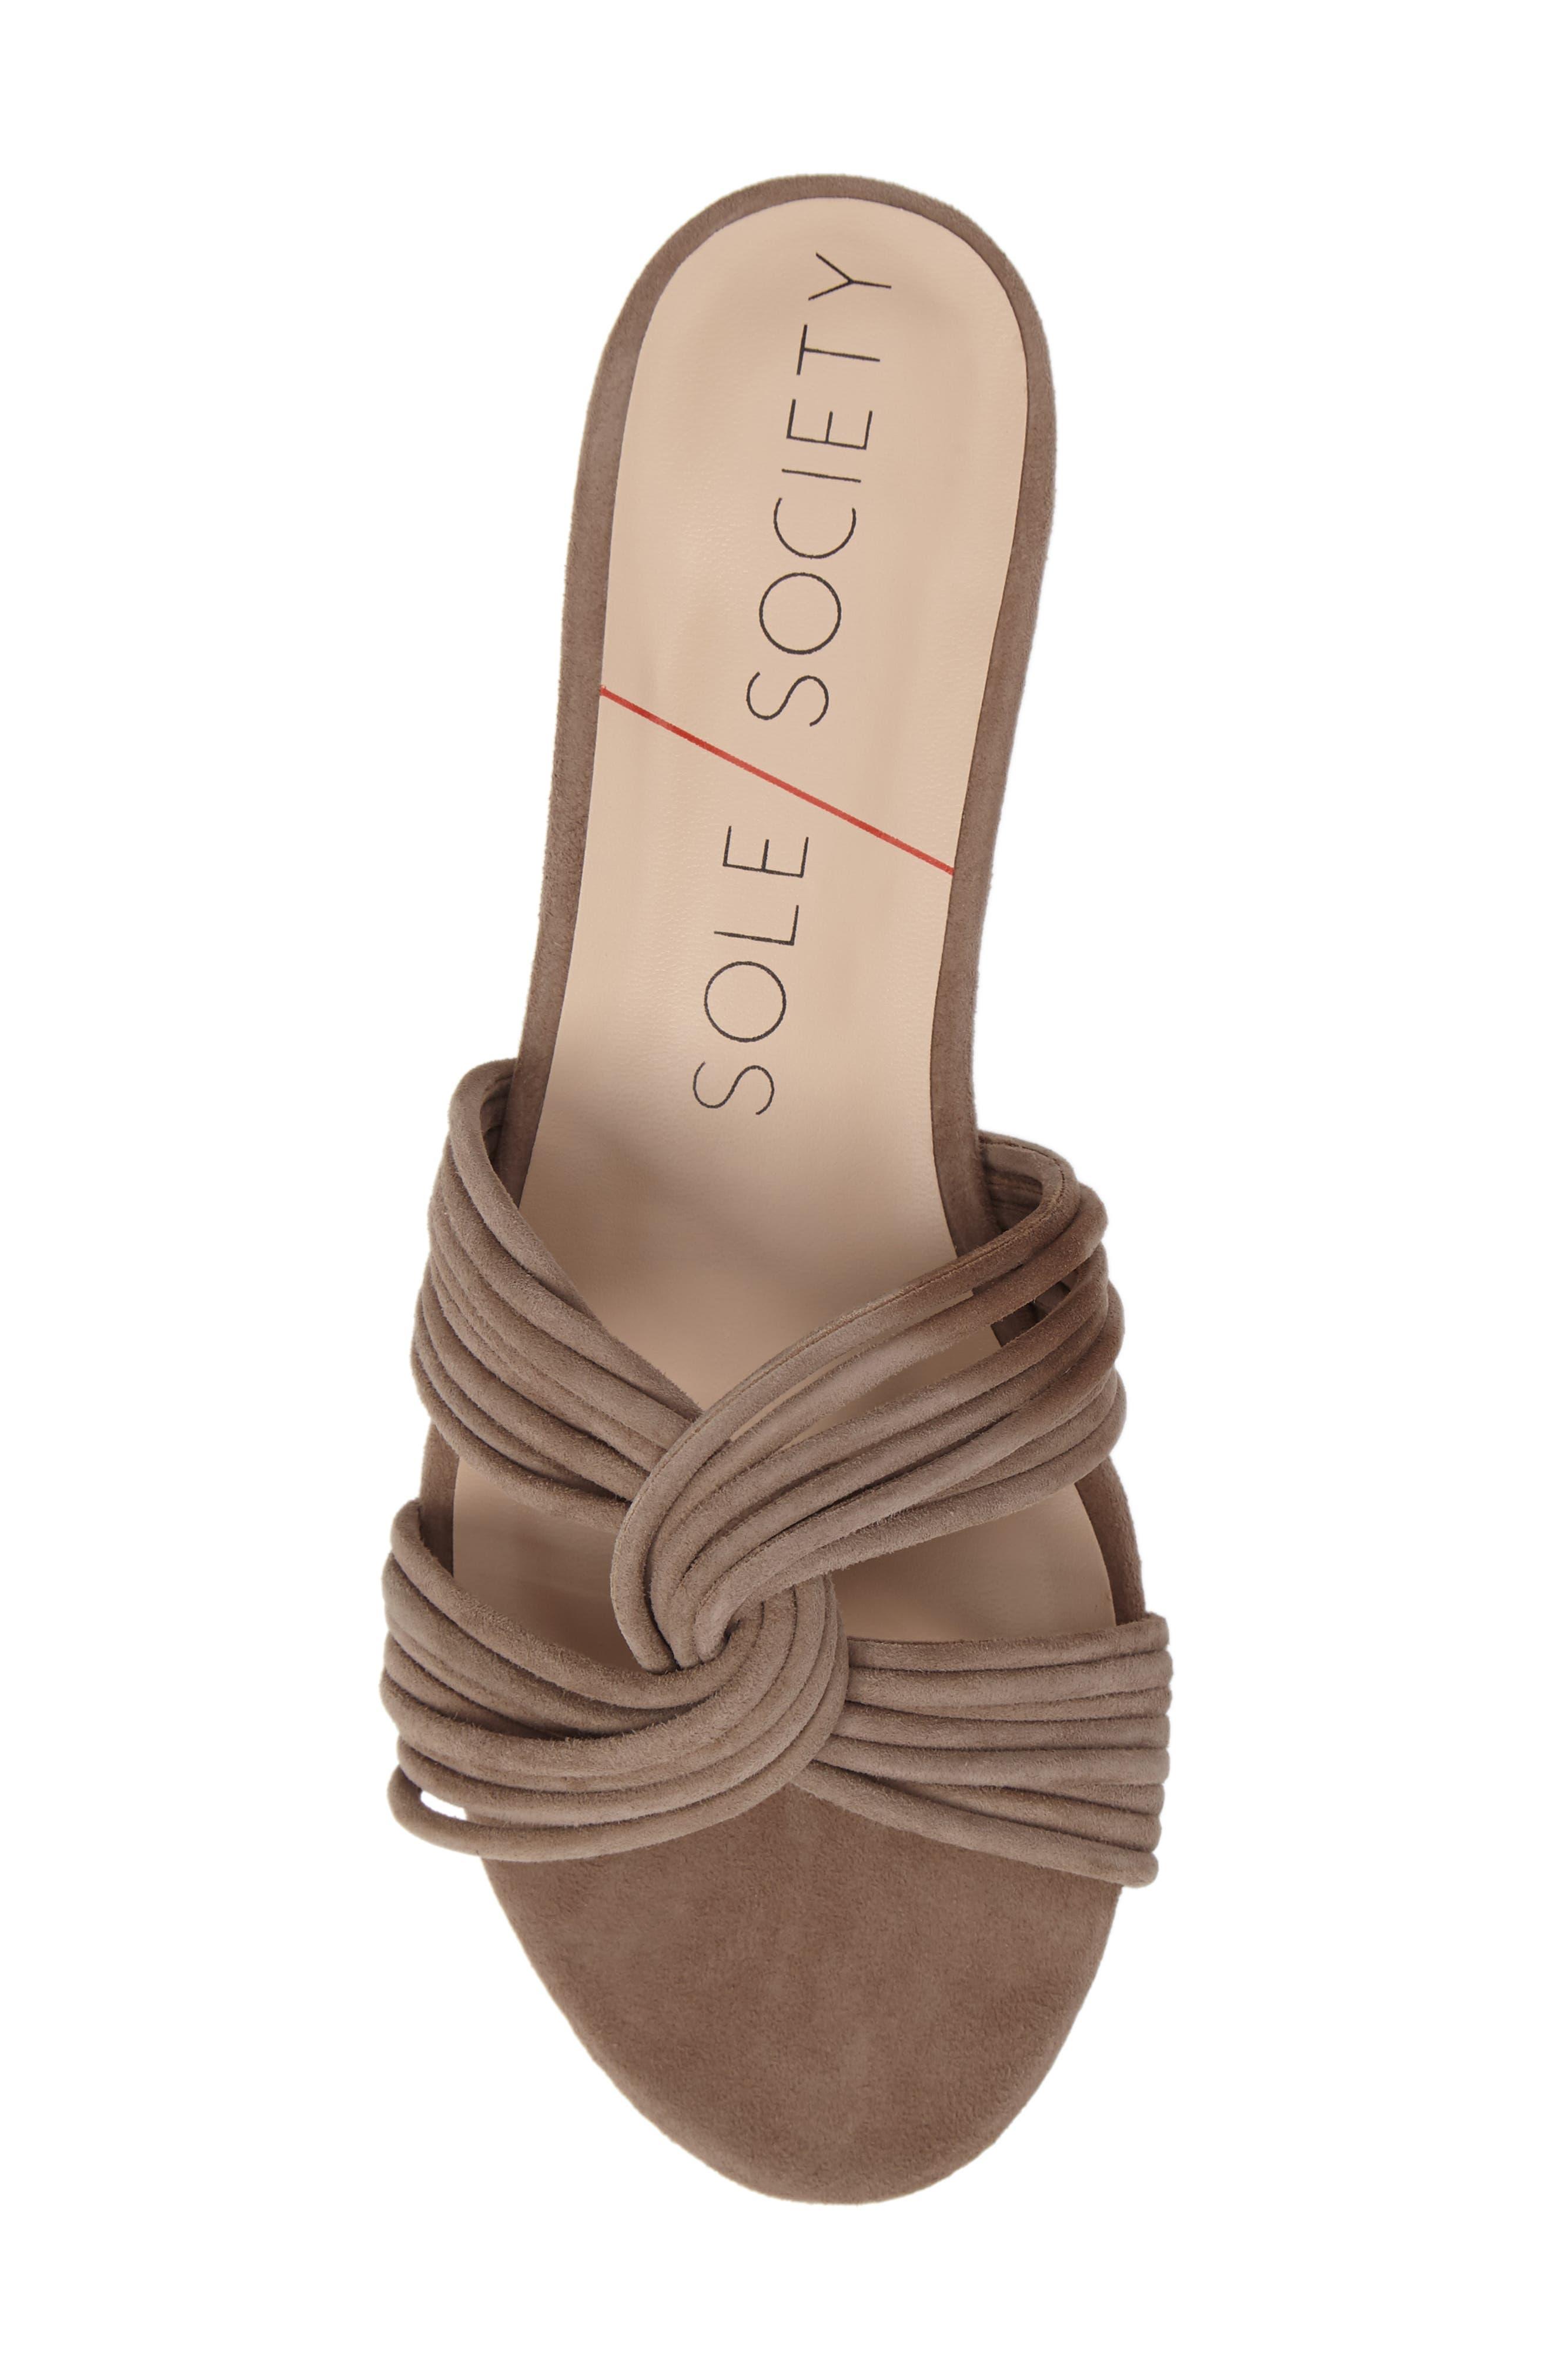 SOLE SOCIETY, Dahlia Flat Sandal, Alternate thumbnail 5, color, 240